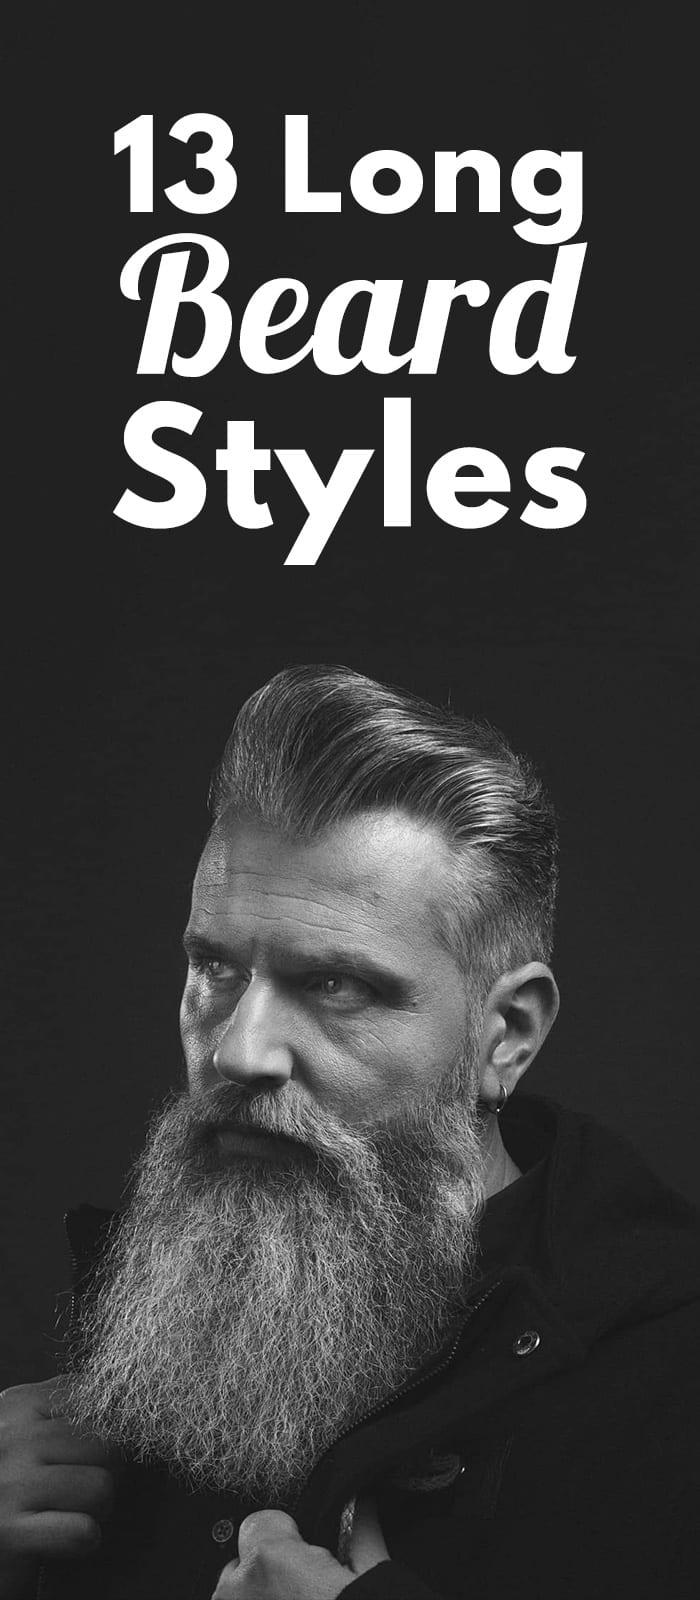 13 Long Beard Styles!